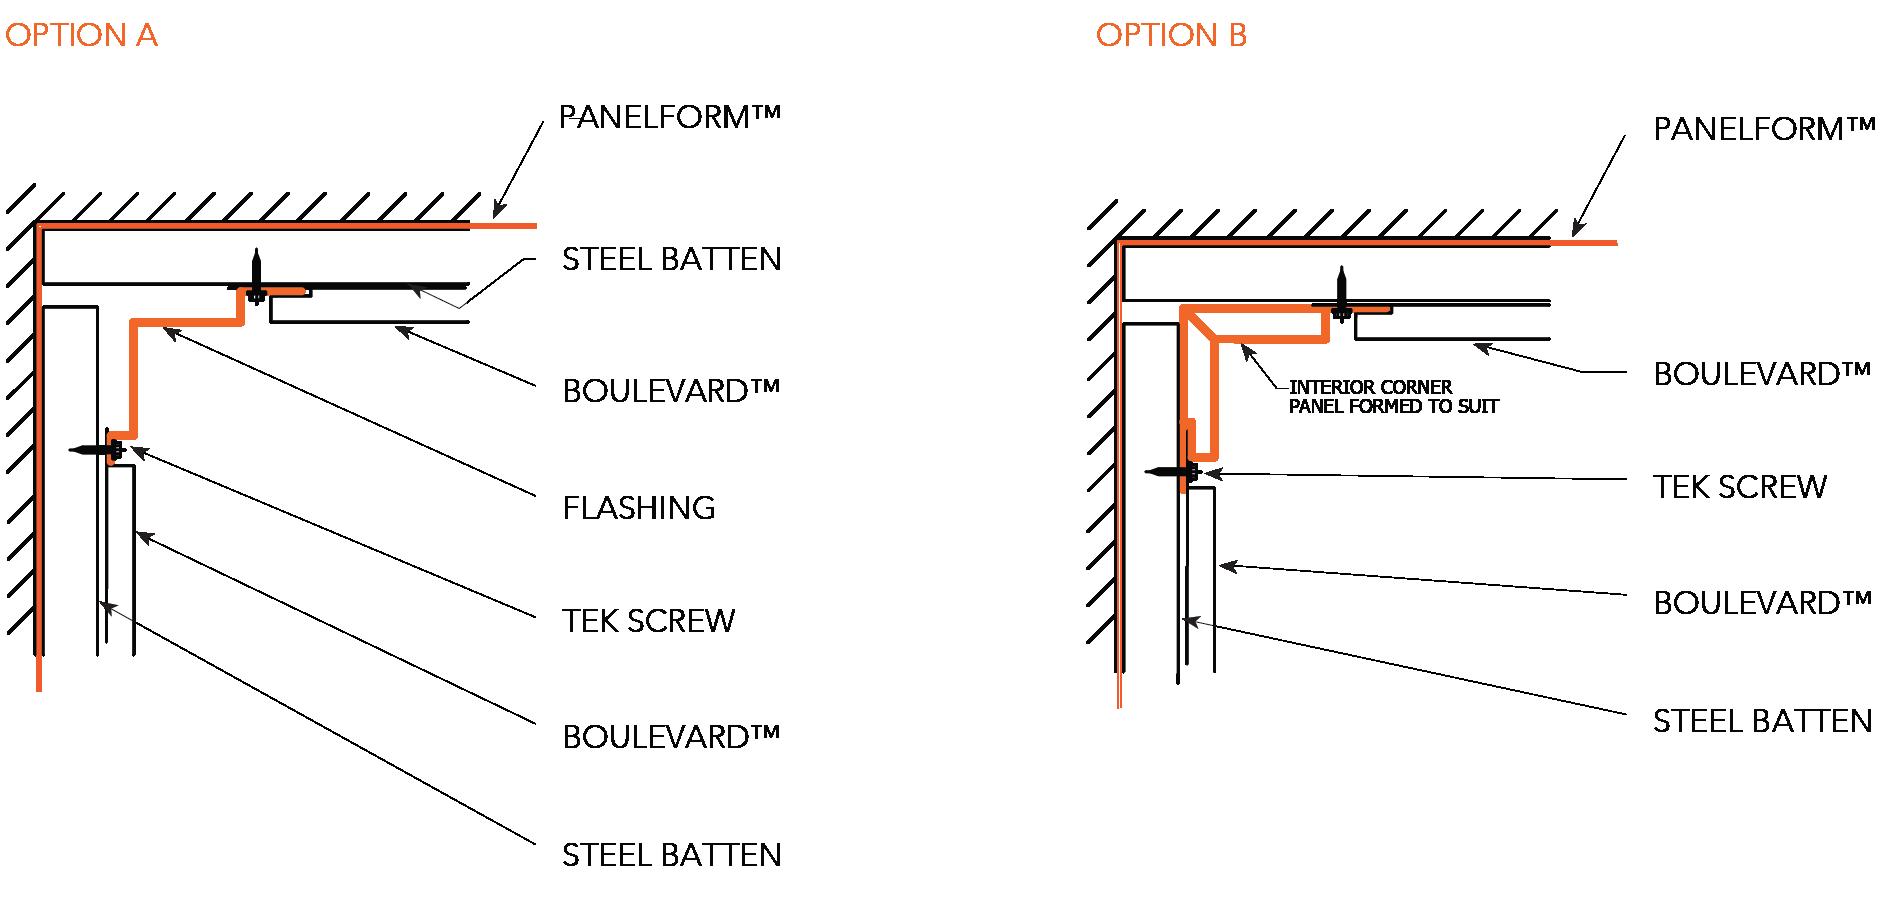 BOULEVARD™ NON-CYCLONIC Installation Details Interior Corner - Vertical Panels Figure BL ID NC 015